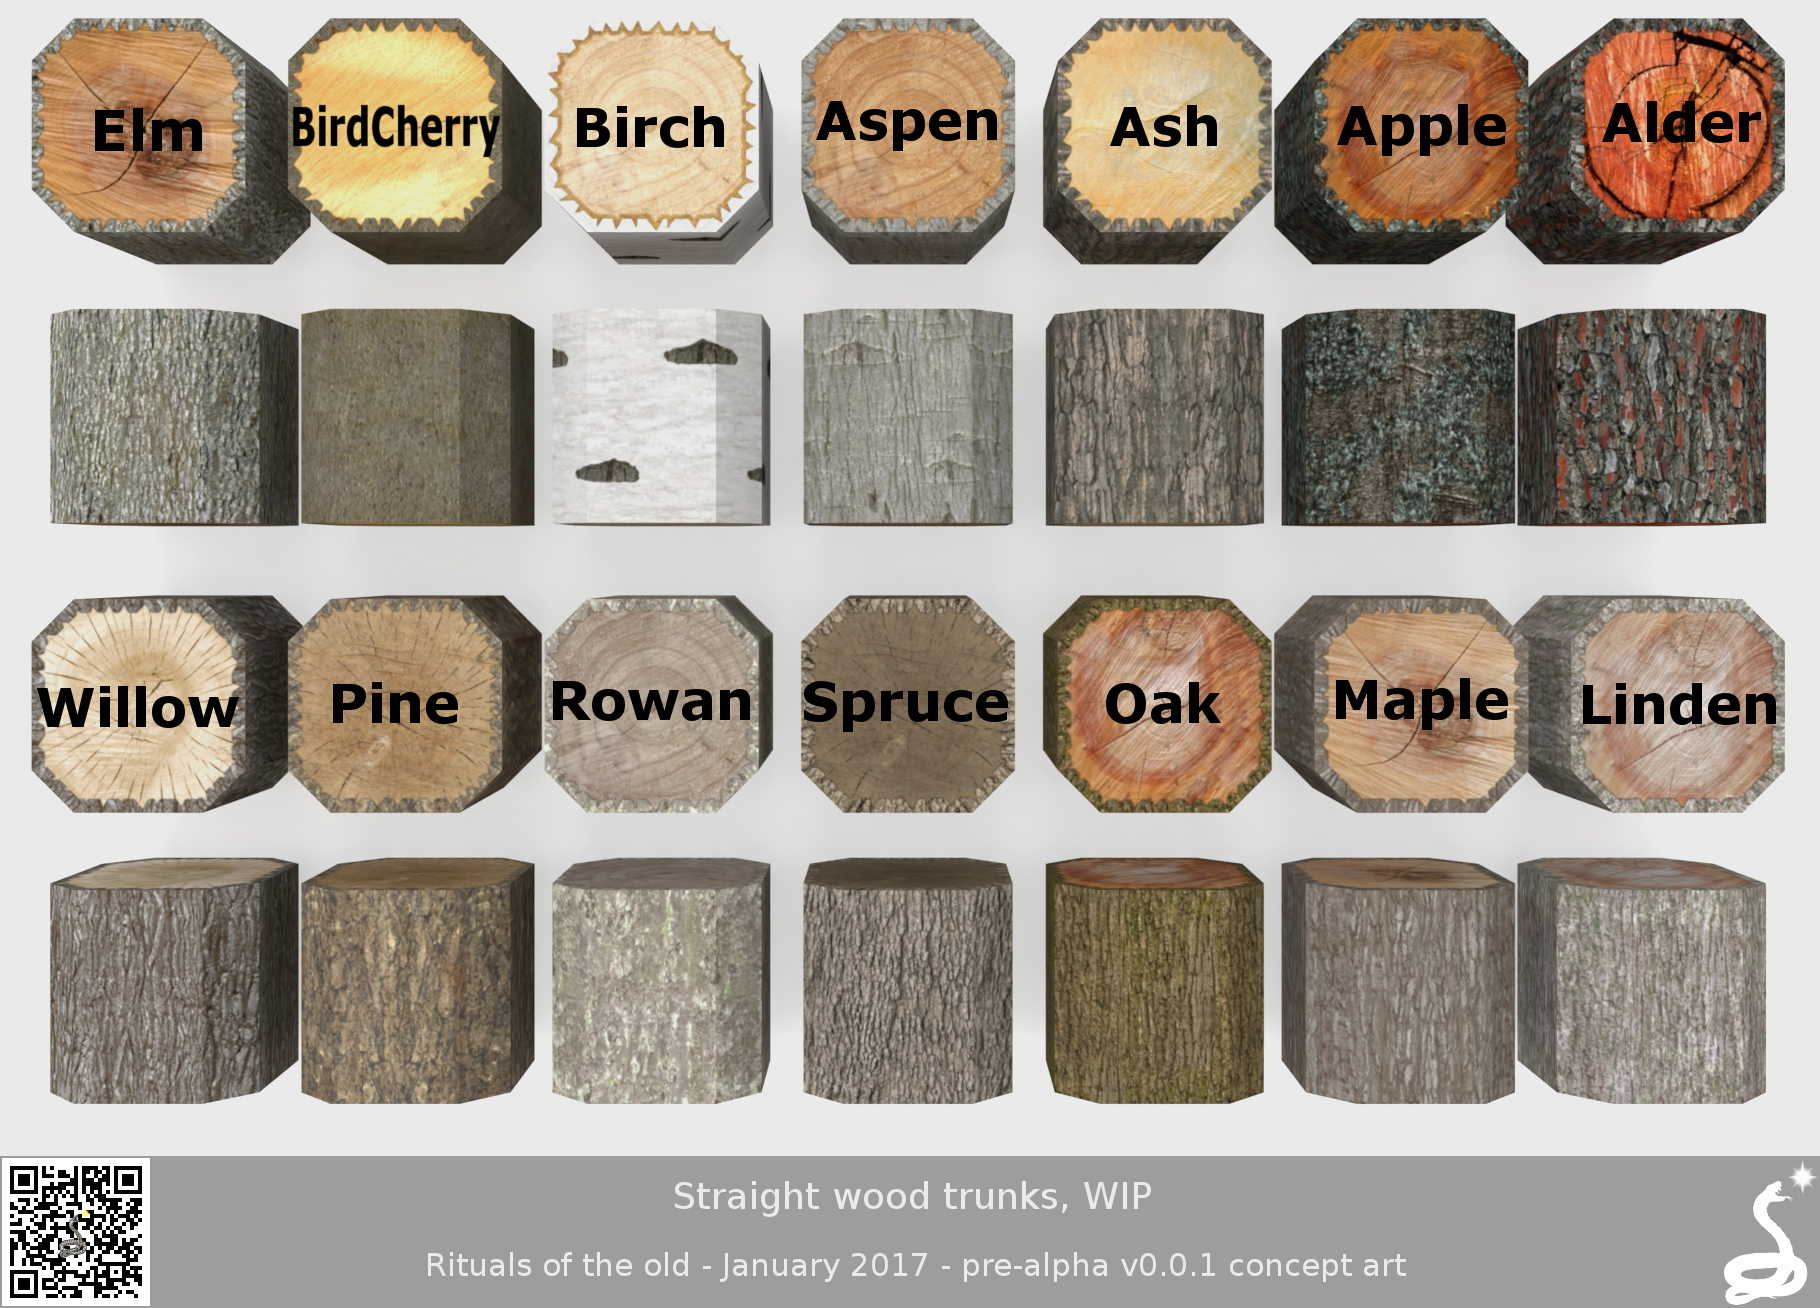 wood trunks